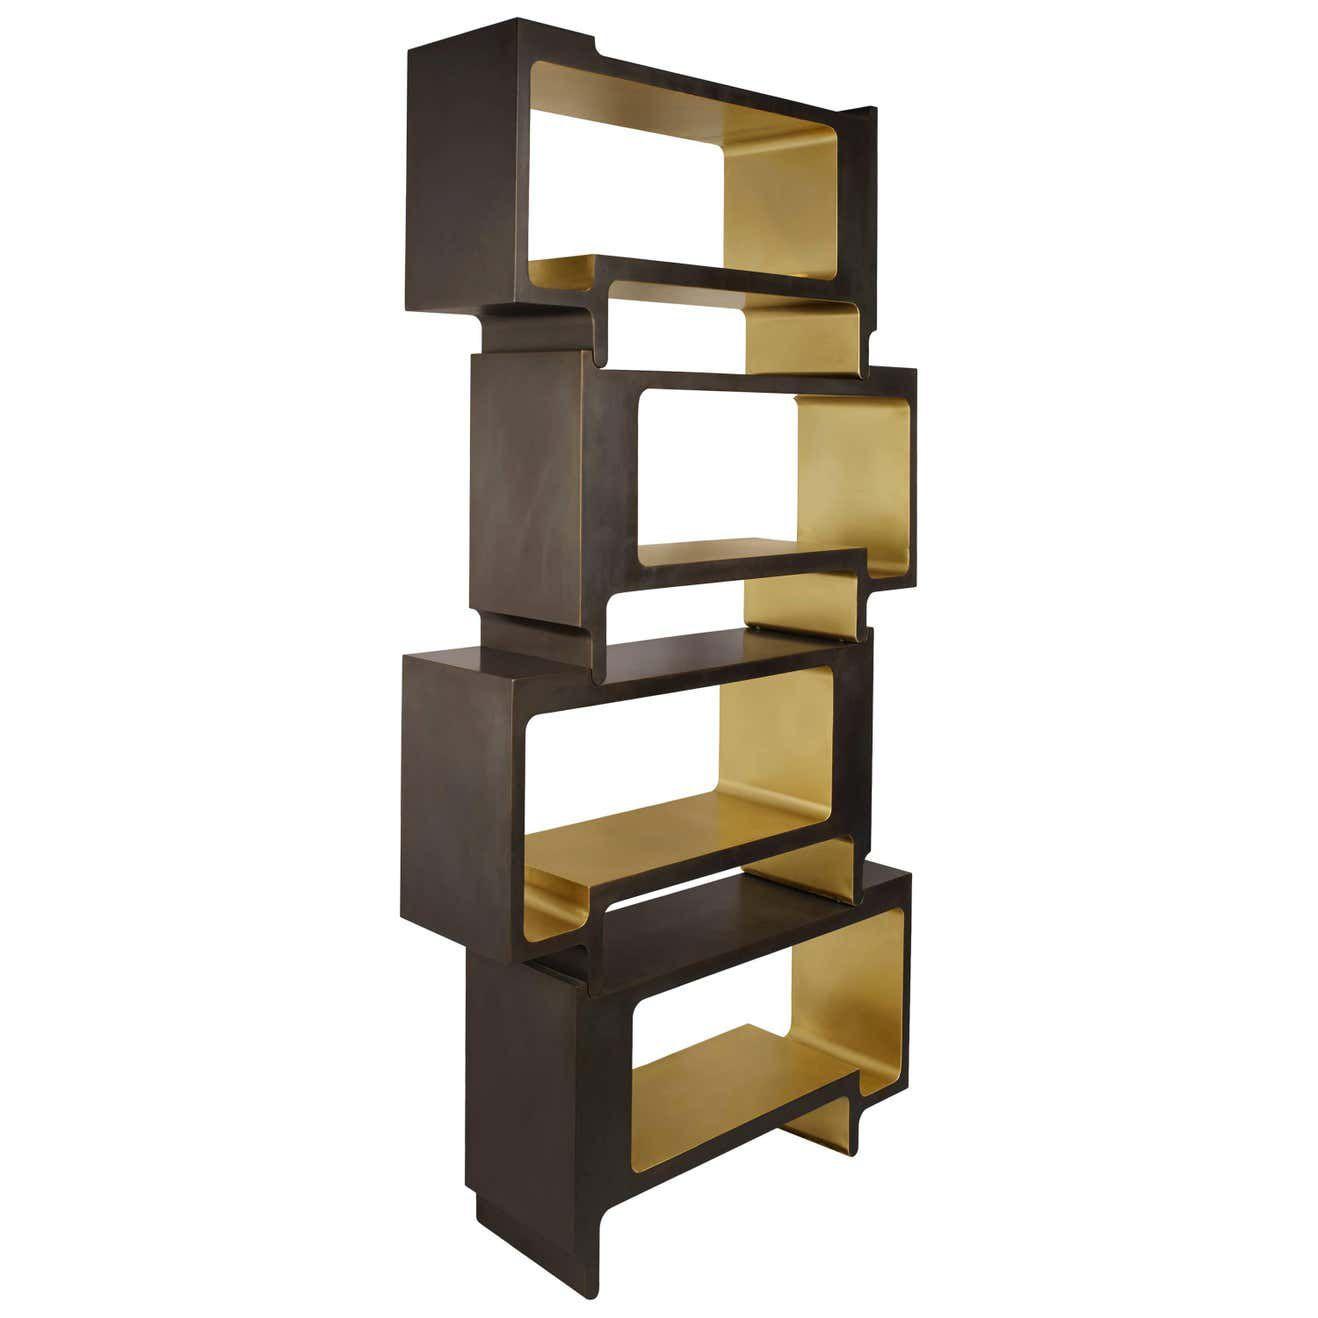 Bronze bookcase divider